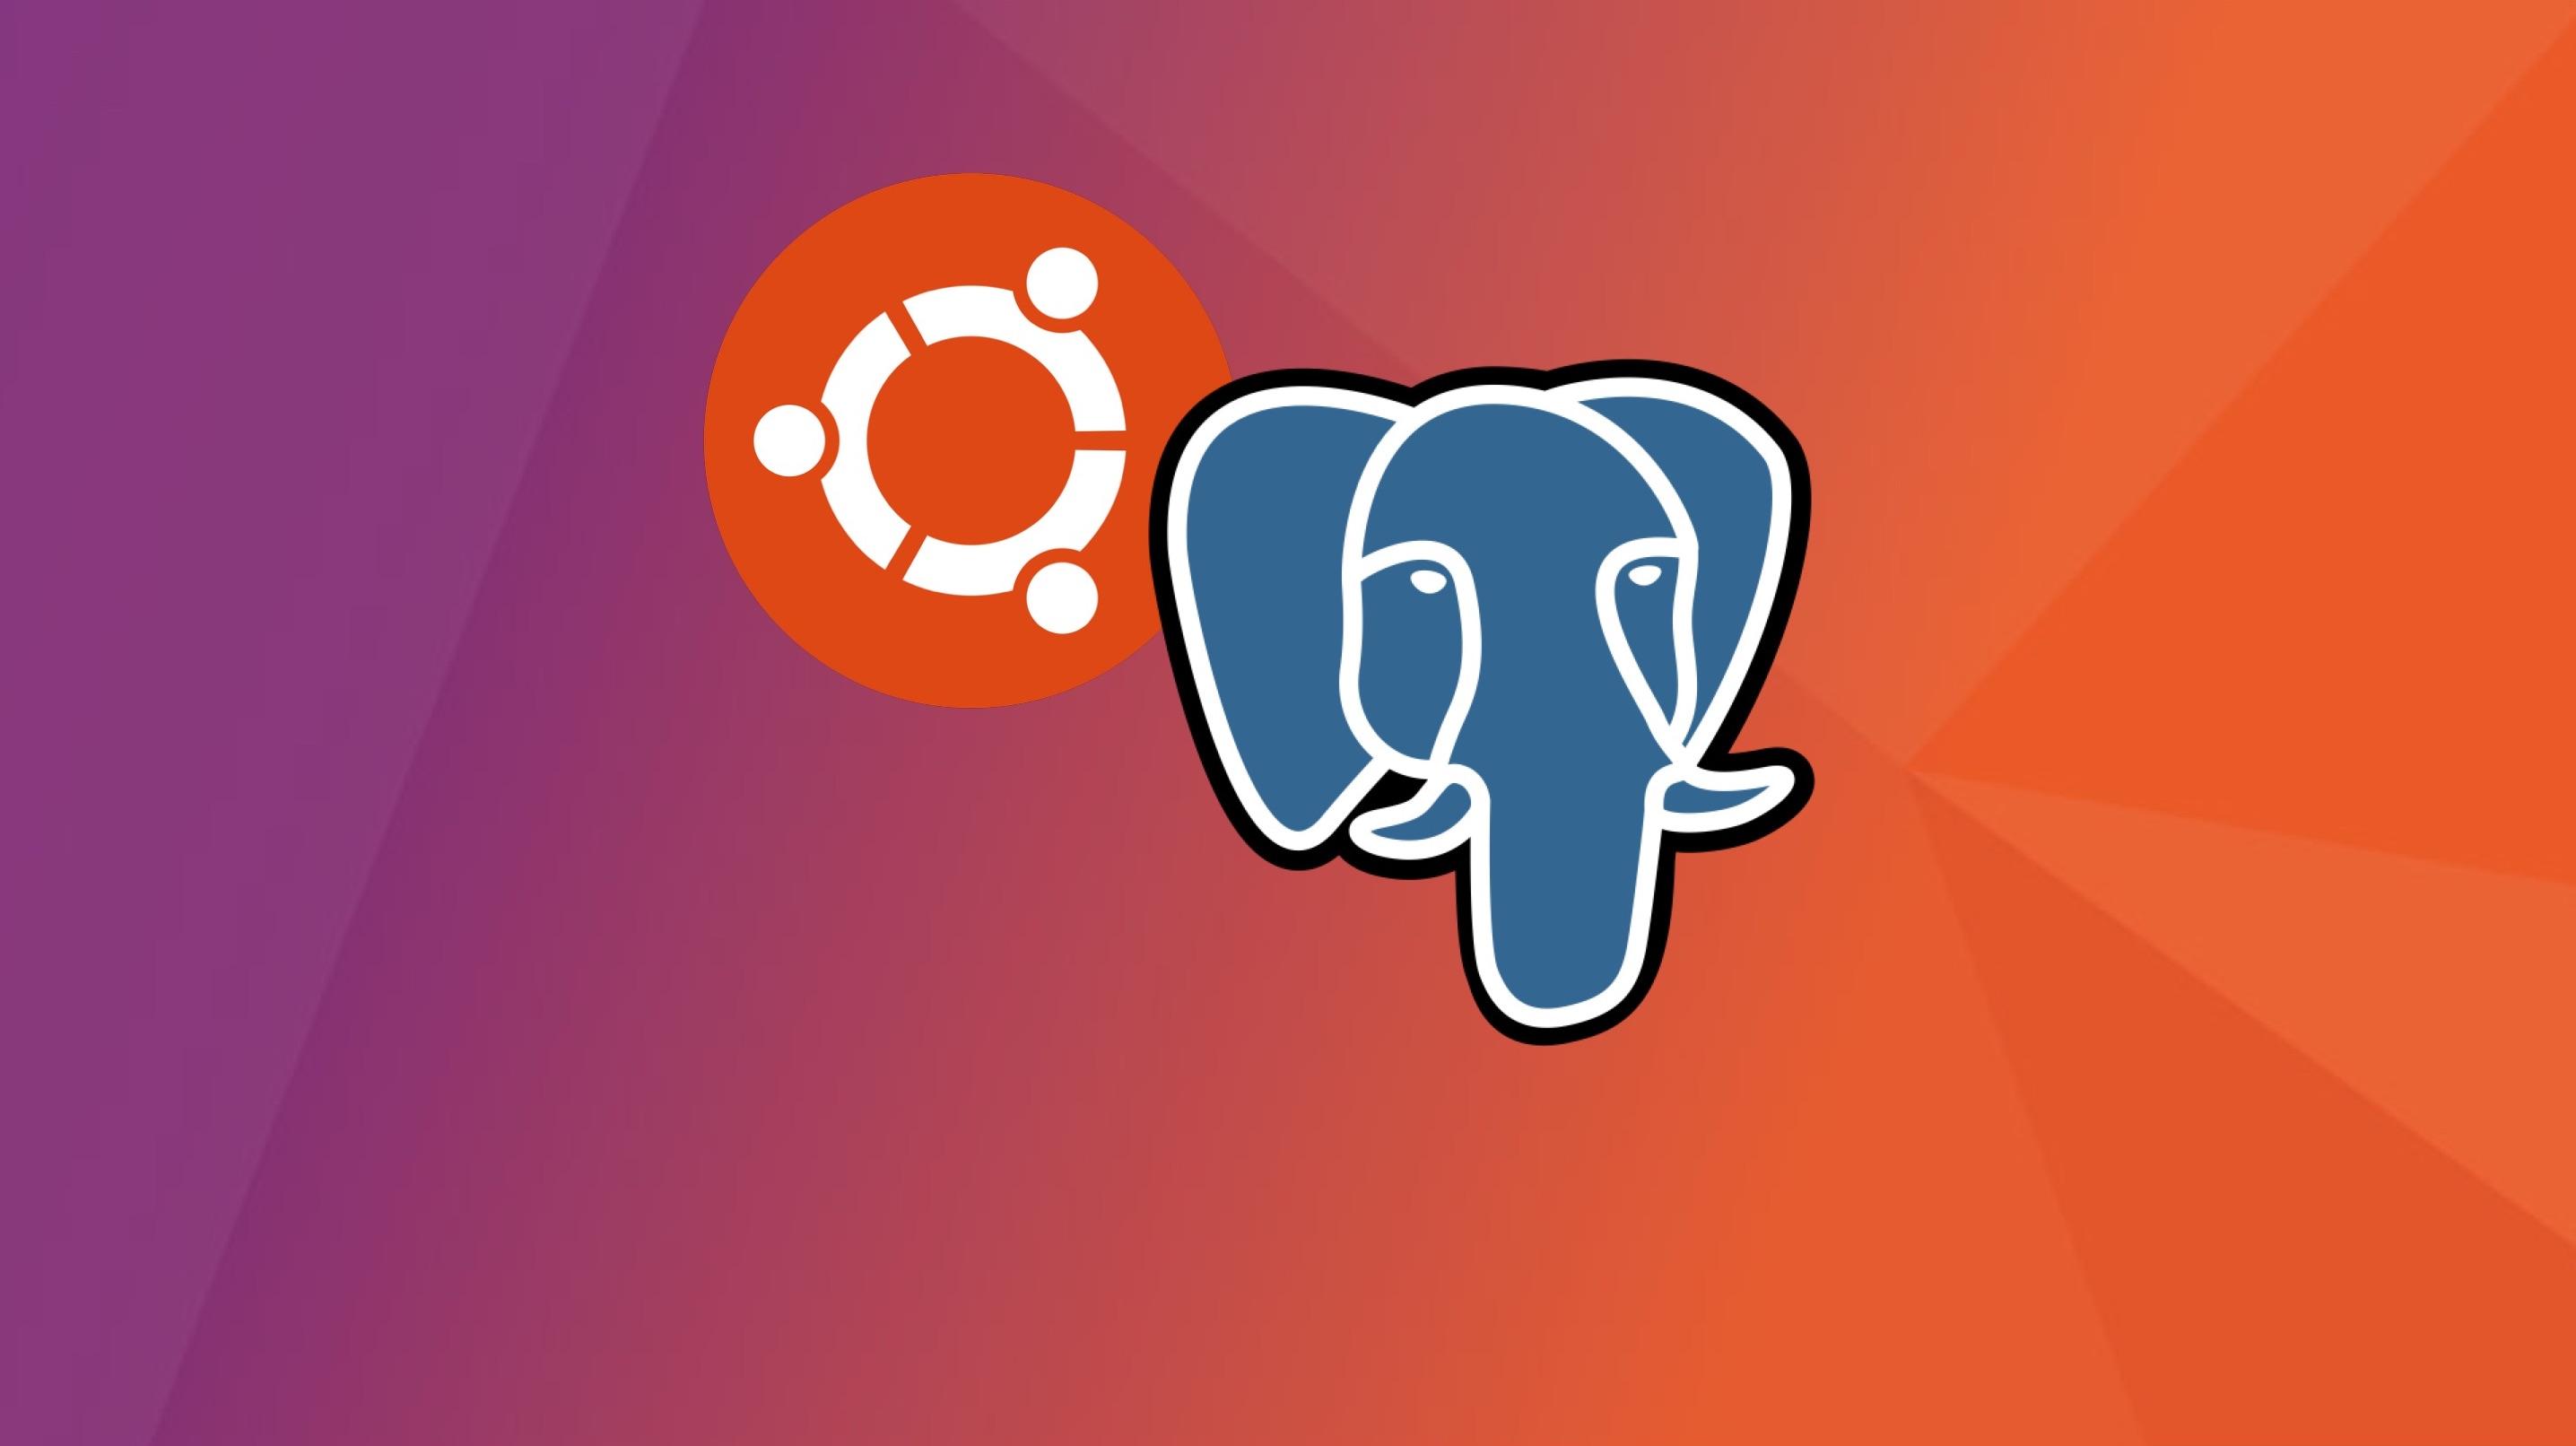 How To: PostgreSQL Installation And Configuration In Ubuntu